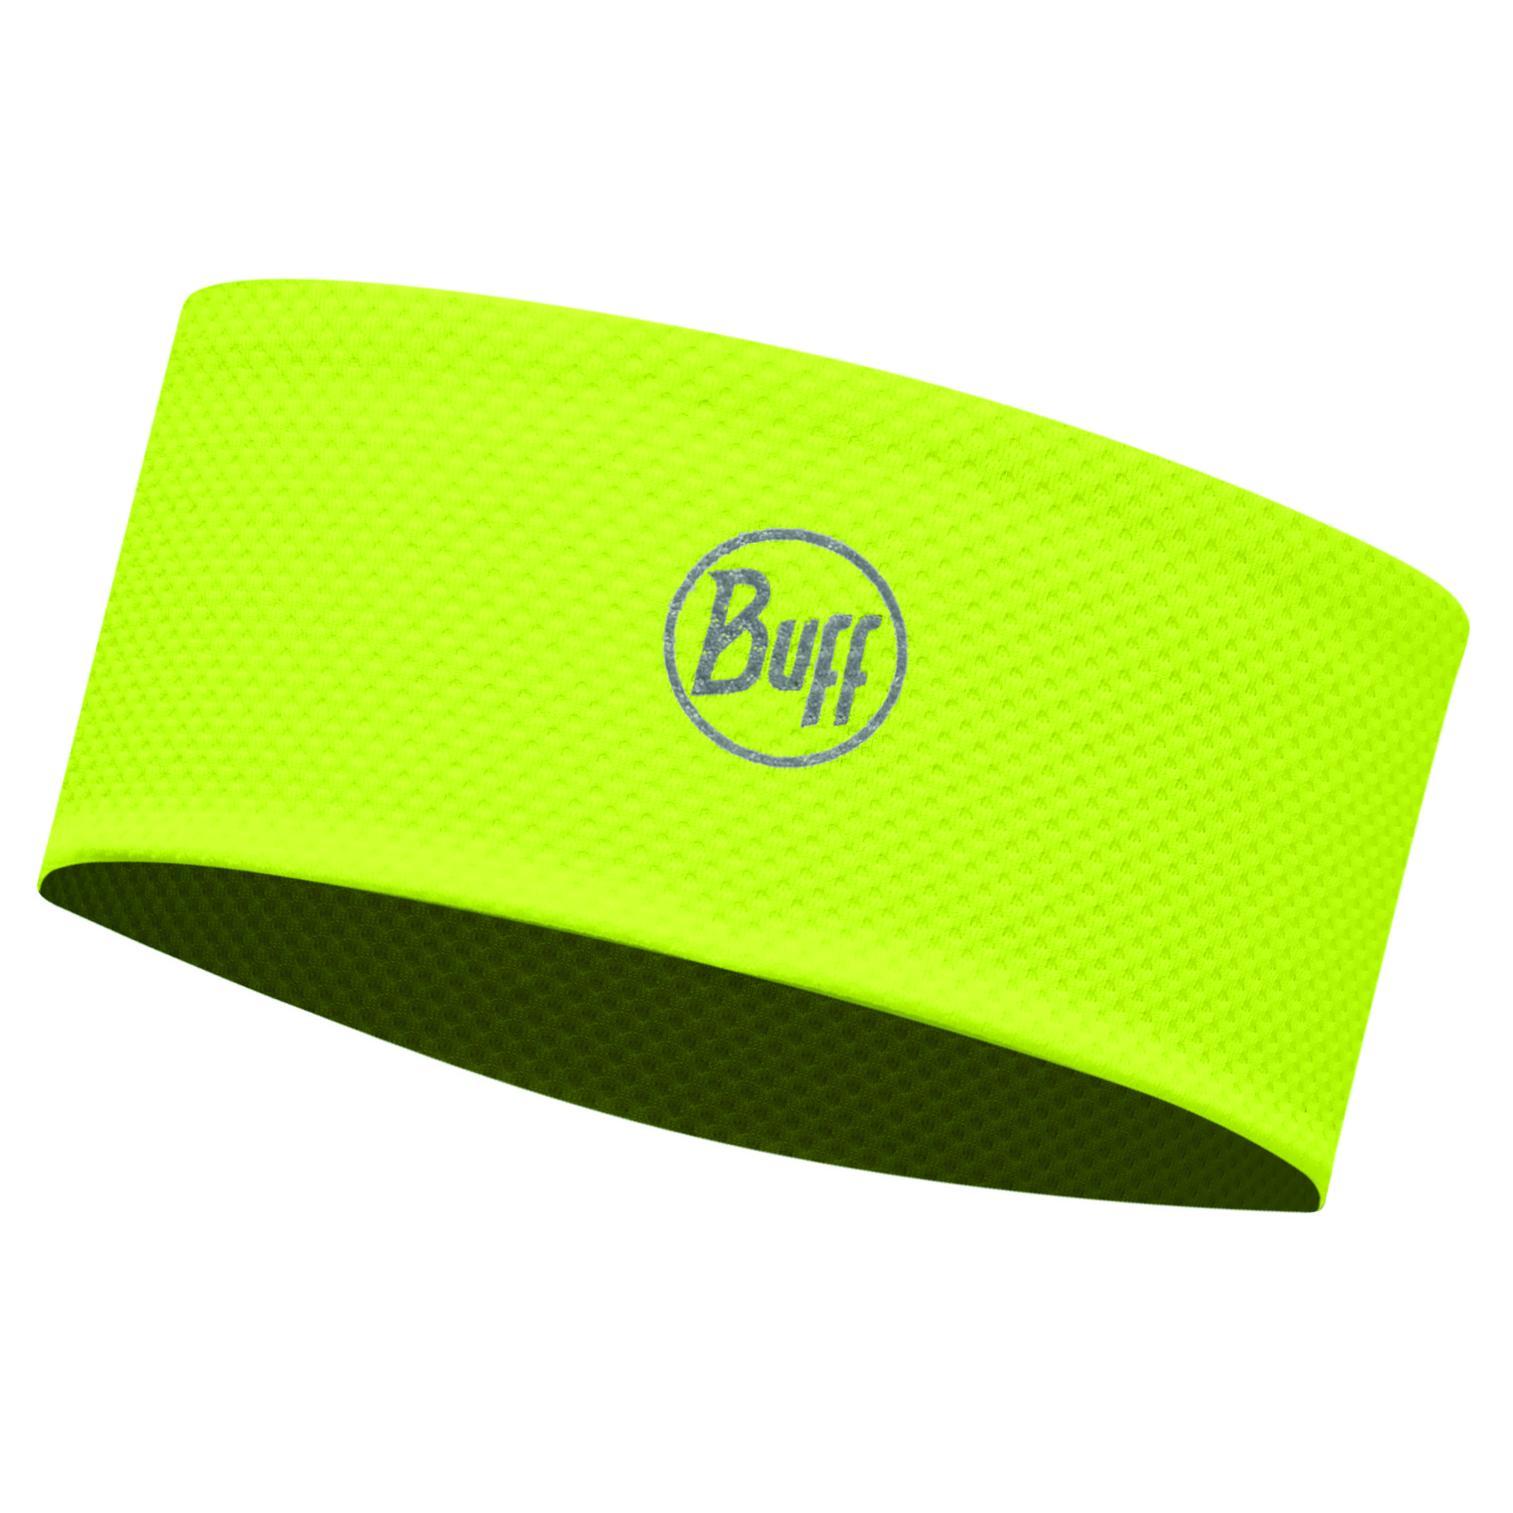 Купить Повязка BUFF FASTWICK HEADBAND R-SOLID YELLOW FLUOR Банданы и шарфы Buff ® 1312855